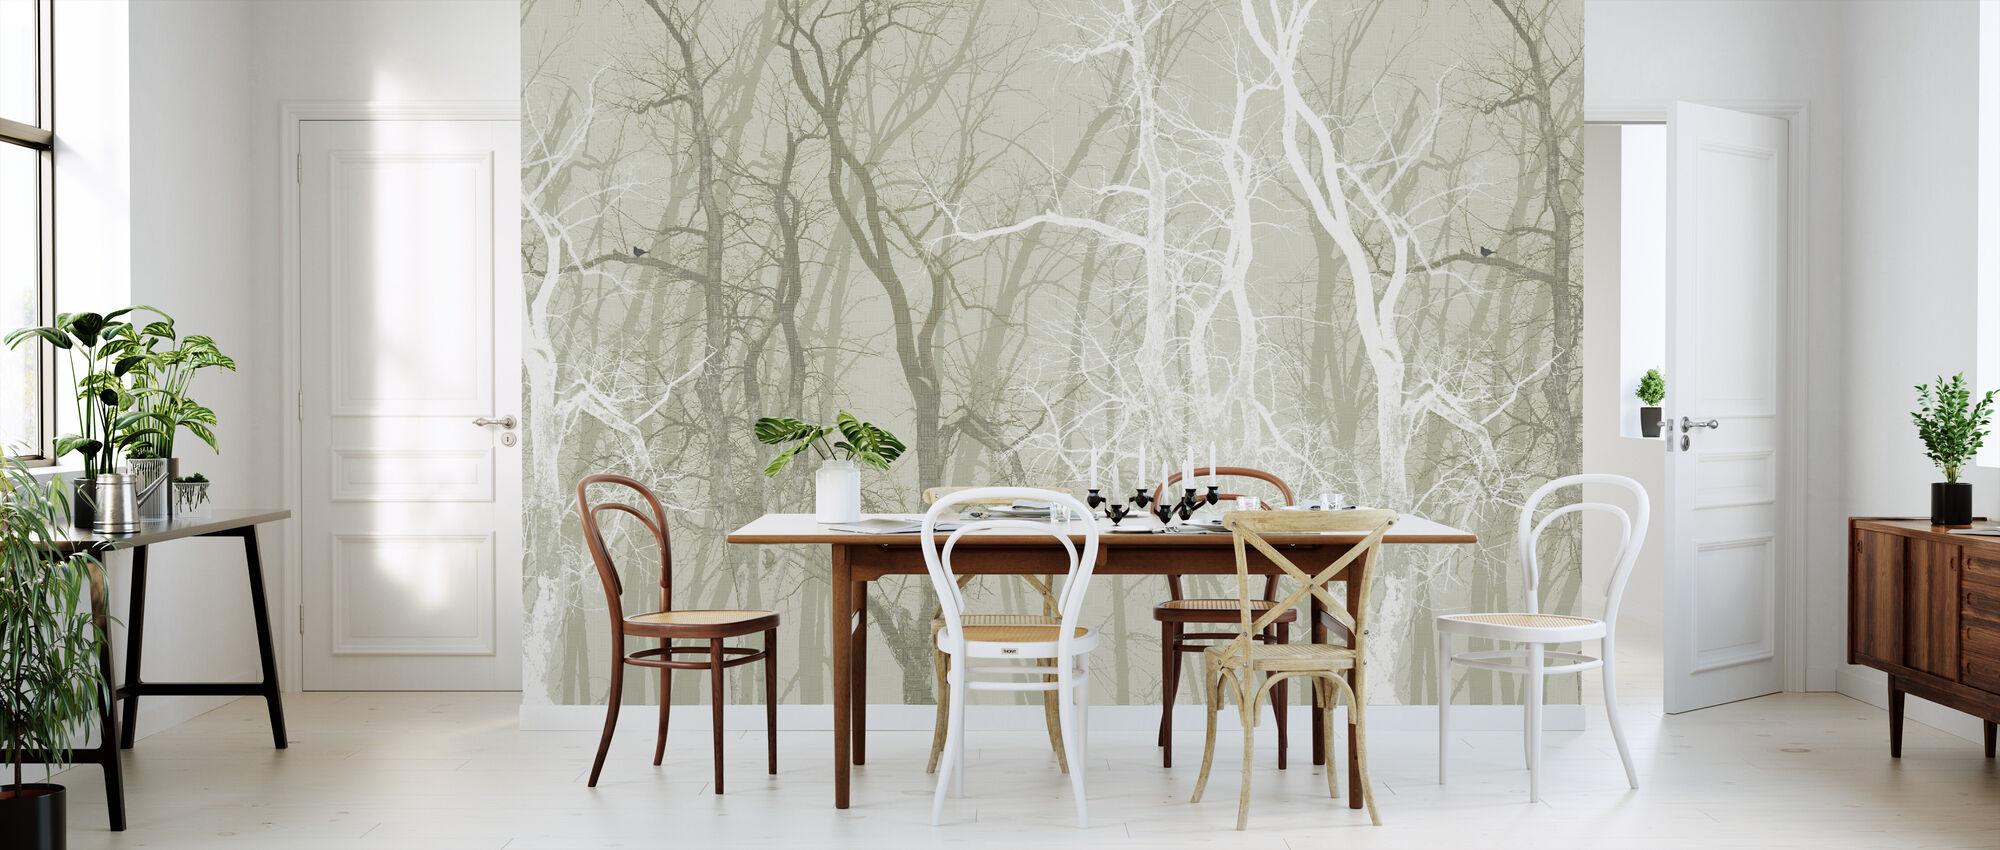 Dwalende bomen Sepia - Behang - Keuken